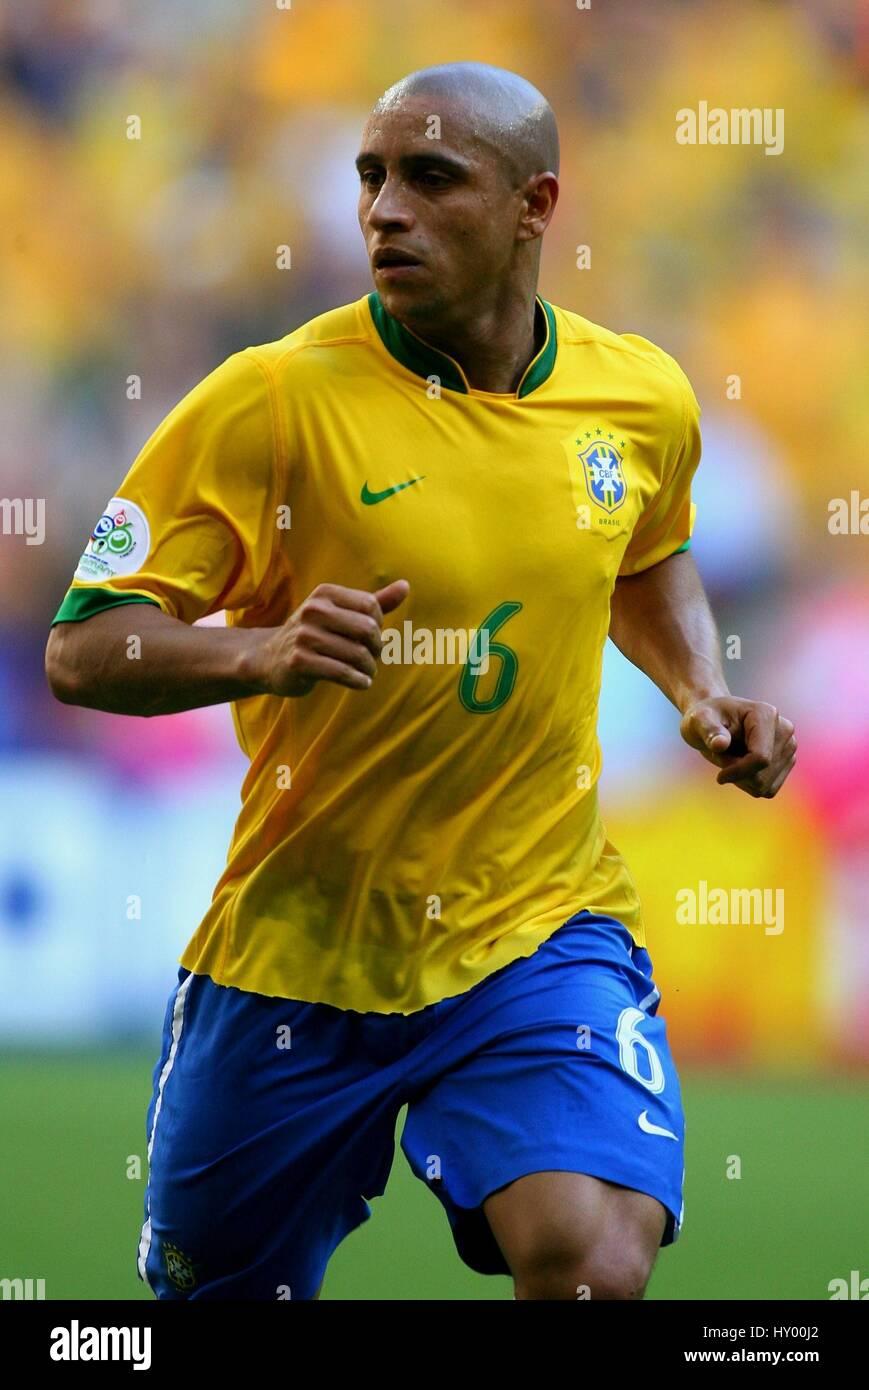 CUP REAL ROBERTO  WORLD MUNICH CARLOS & MADRID BRAZIL